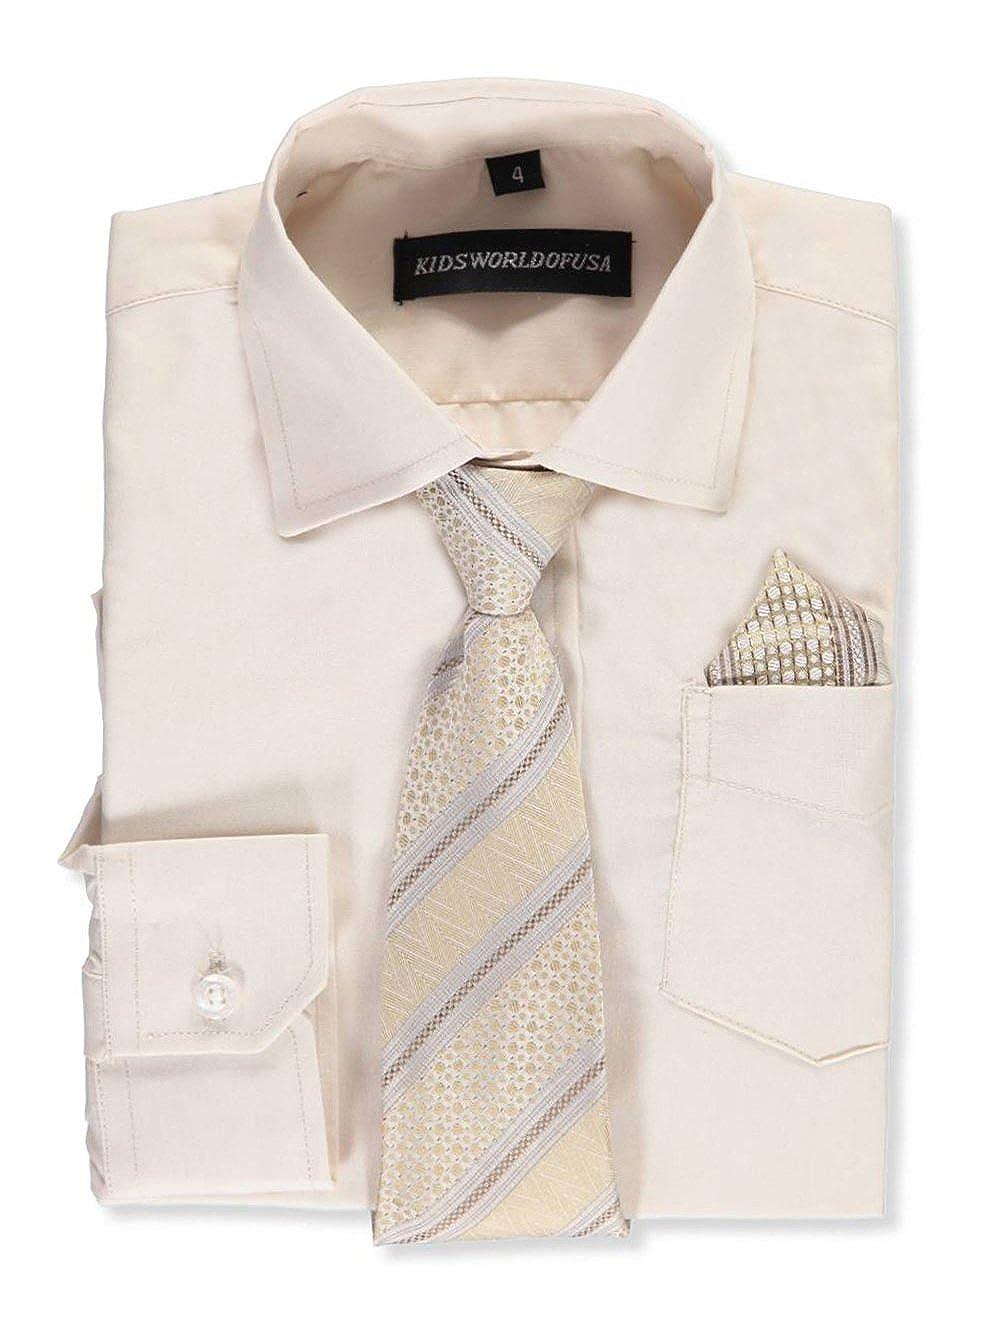 Kids World Big Boys' Dress Shirt Accessories